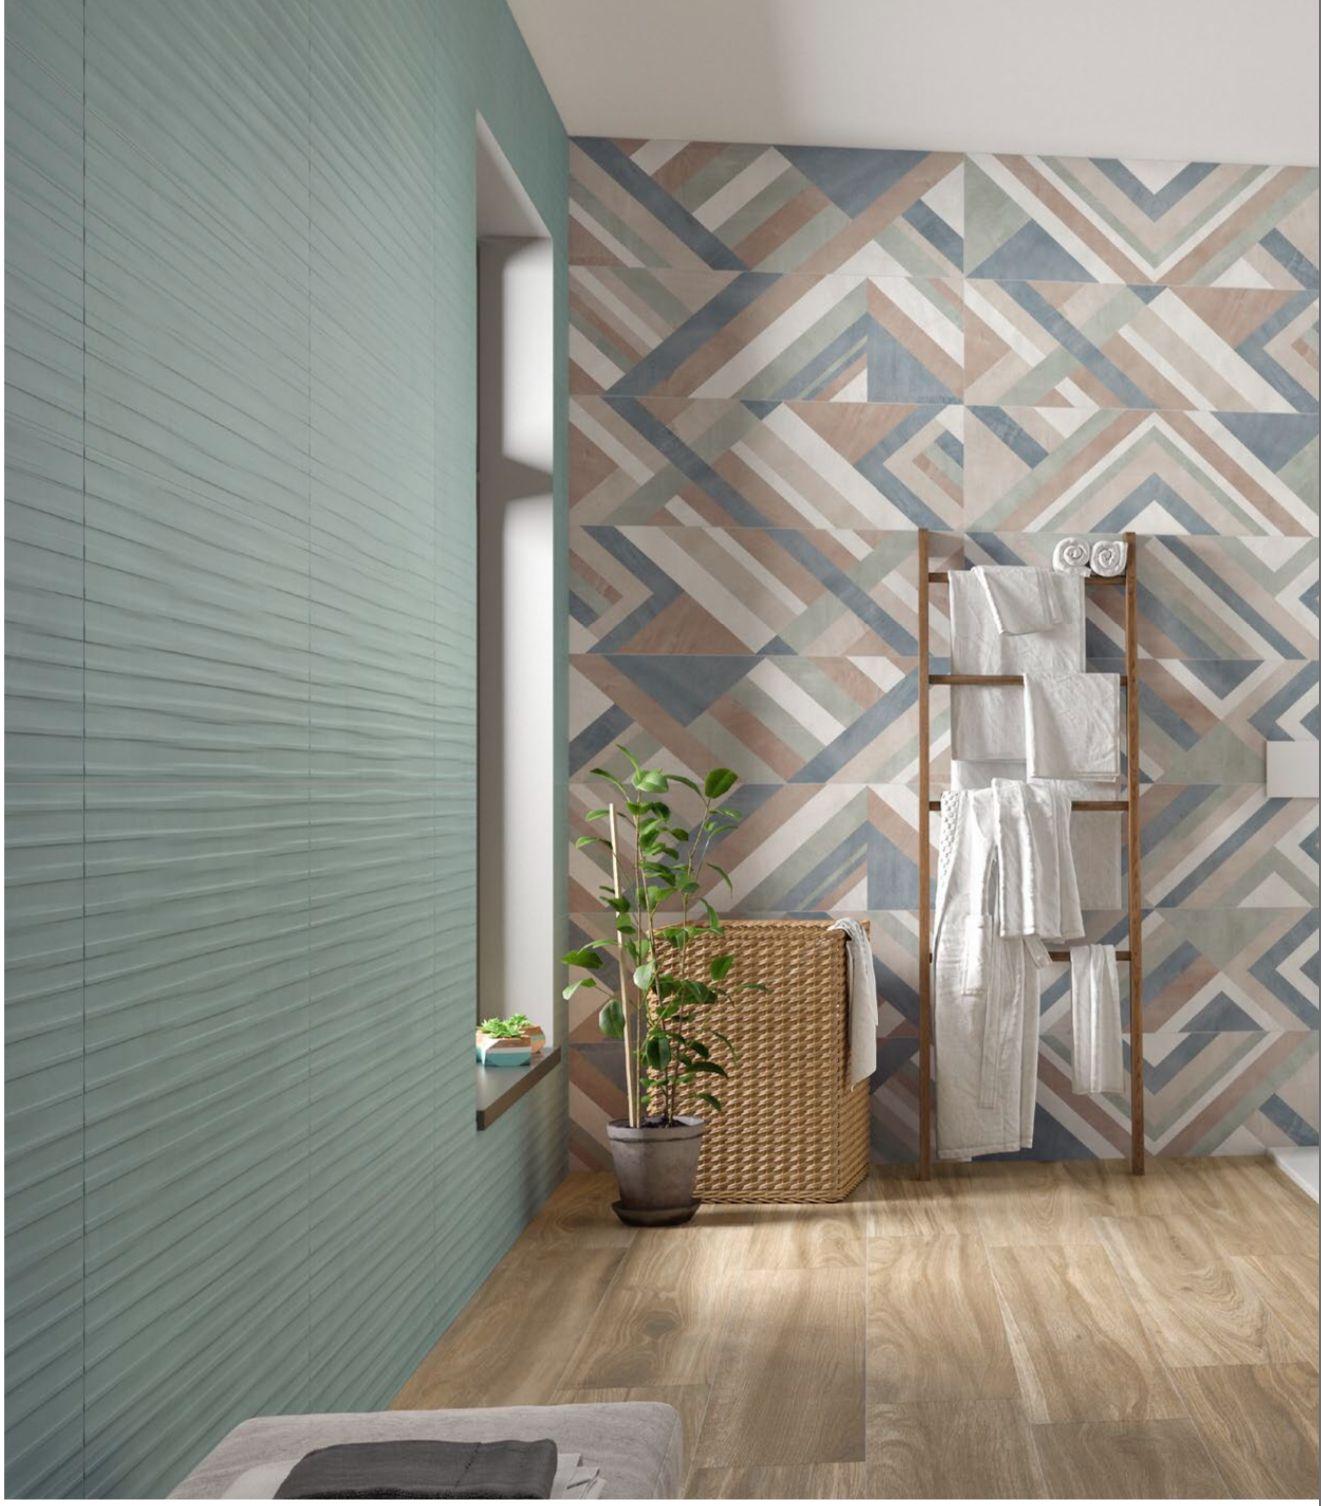 3d Home Designbest: Pin Di Krist Na Bla Kov Su Ba Os Modernos